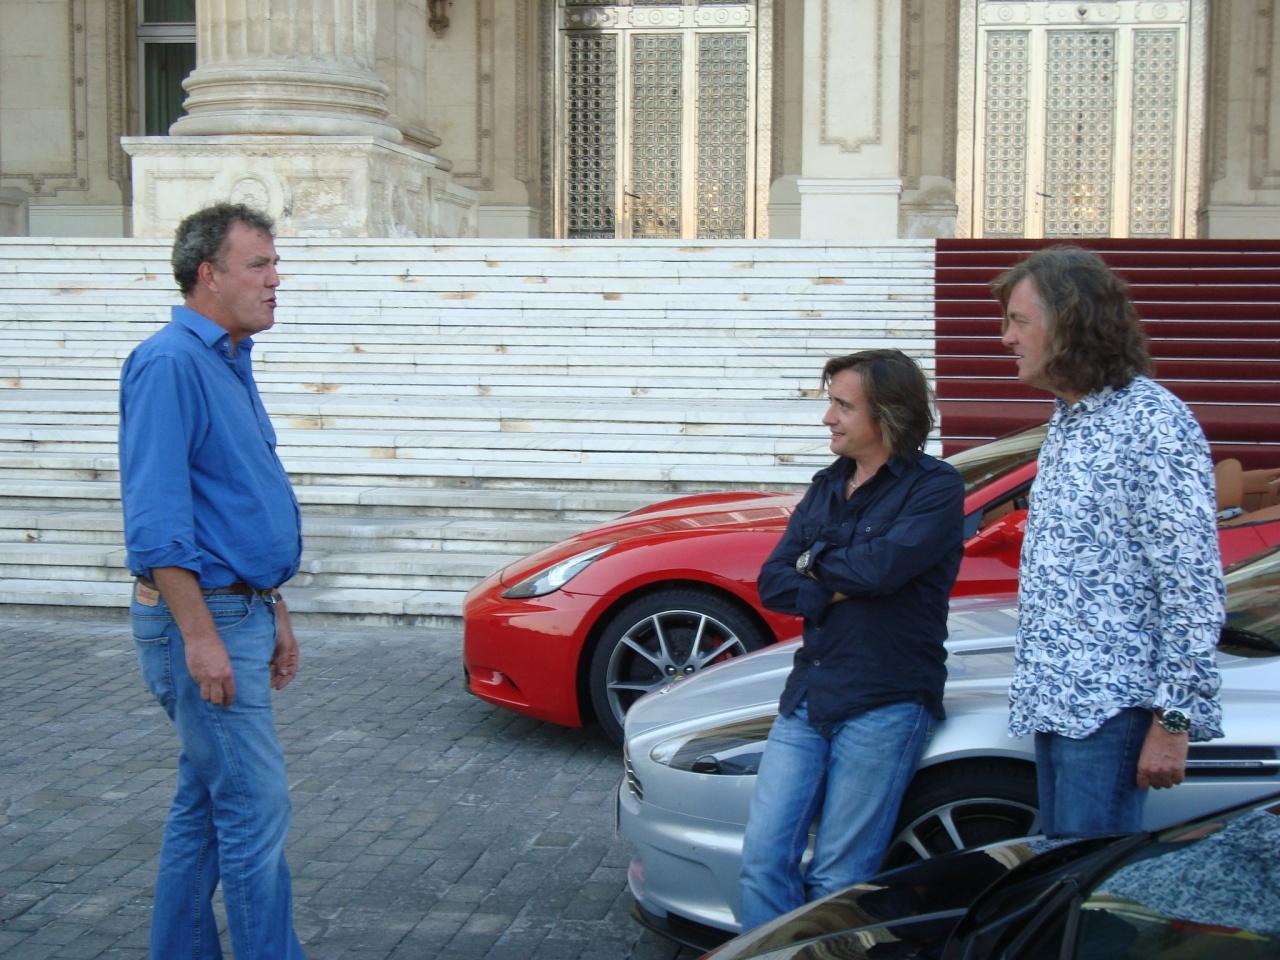 Top Gear, BBC TV